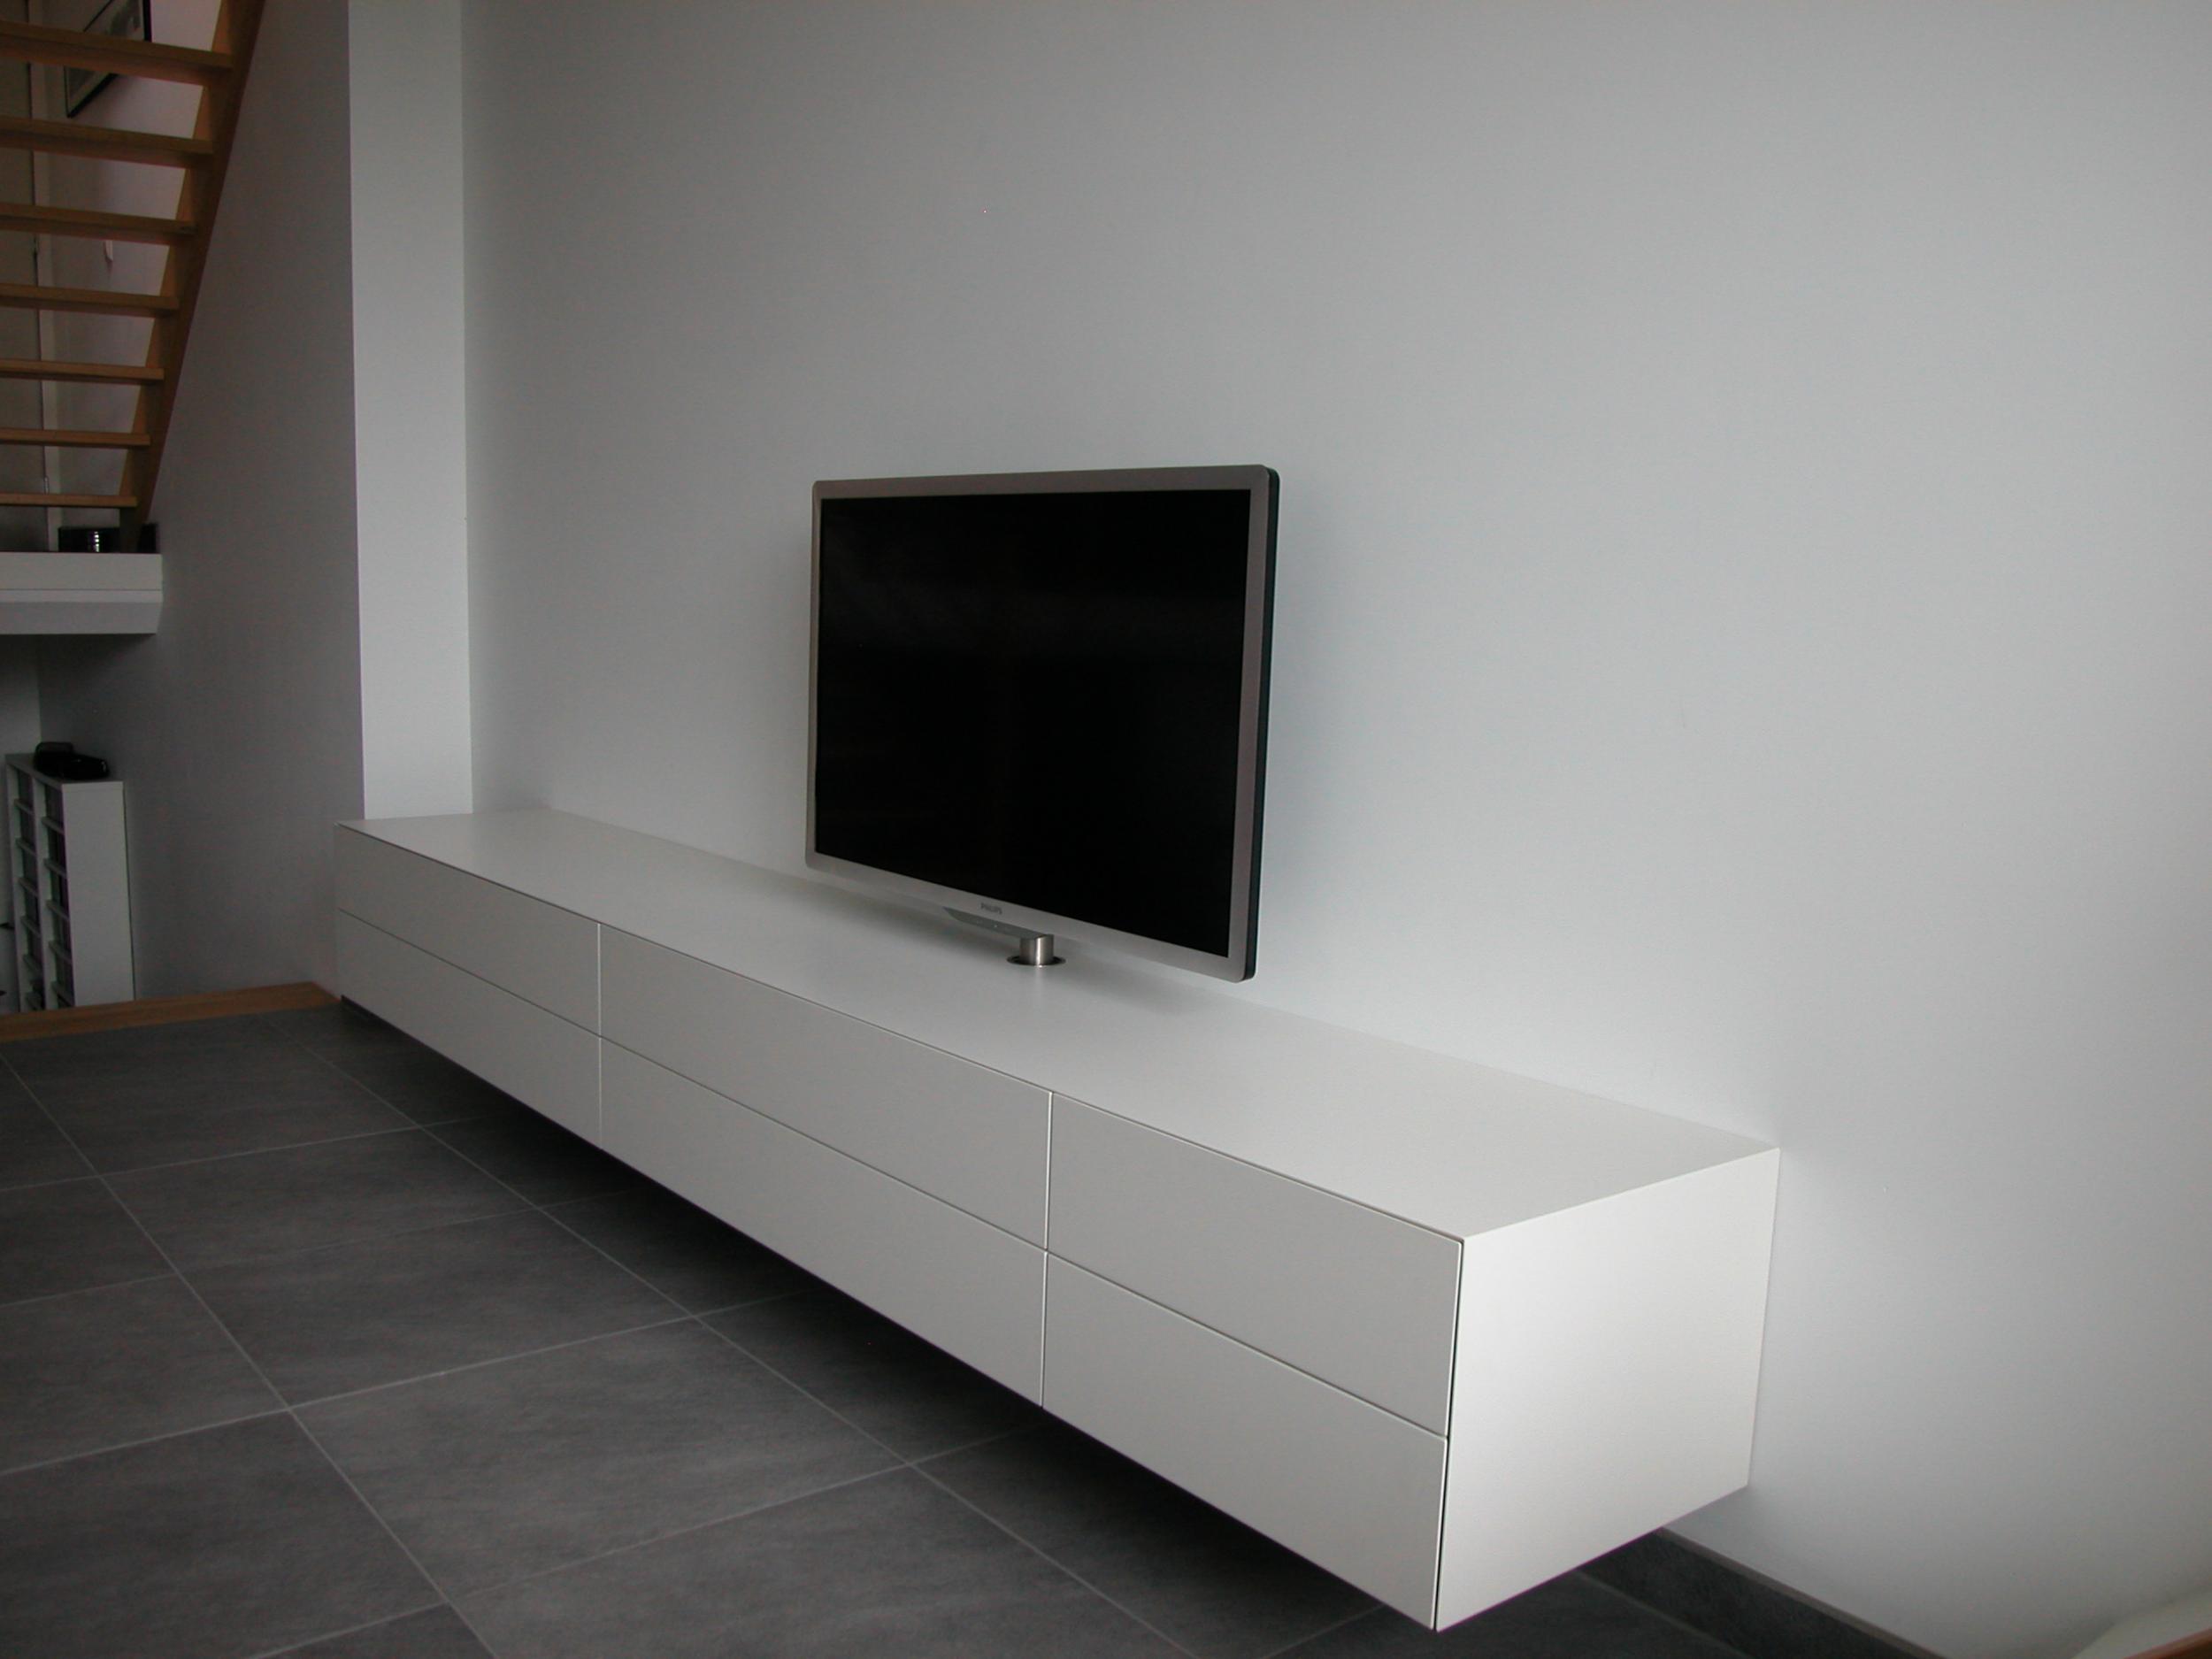 Tv Kast Wit Mat.Artyx The New Design Vision Alpha 320 Supermat Wit Gespoten Tv